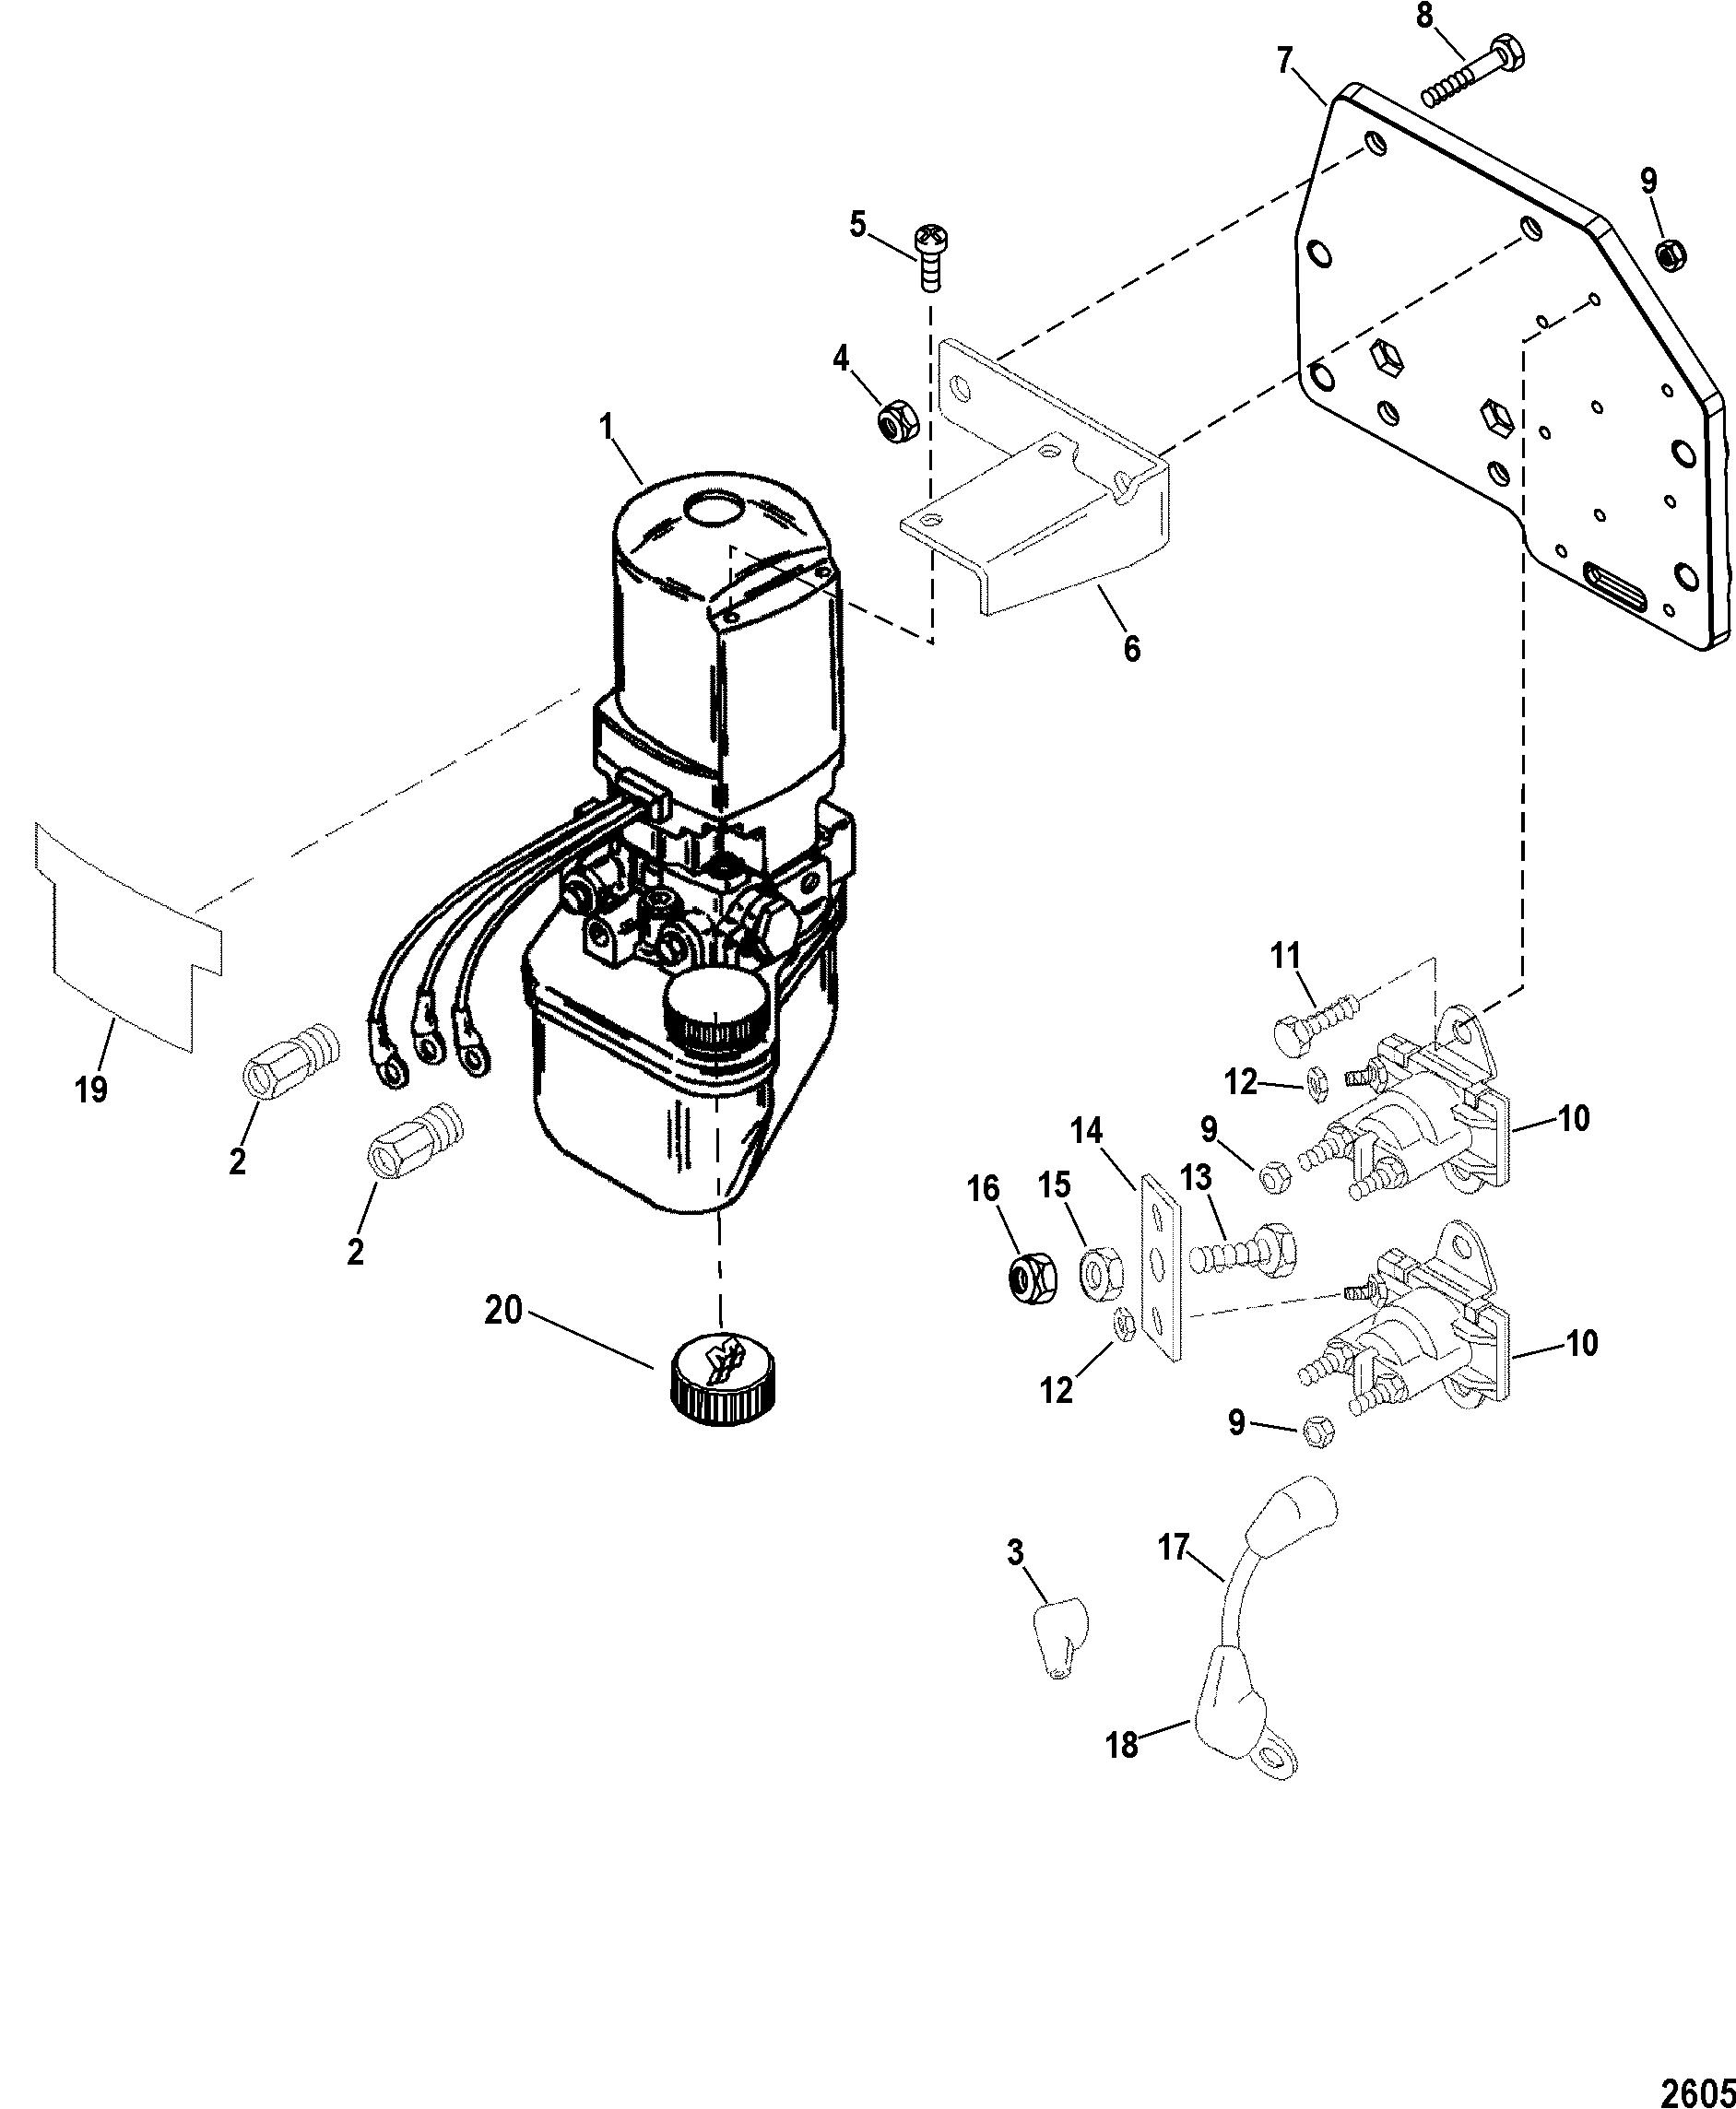 Pump Motor Plastic Resevoir A05 For Trim Tilt